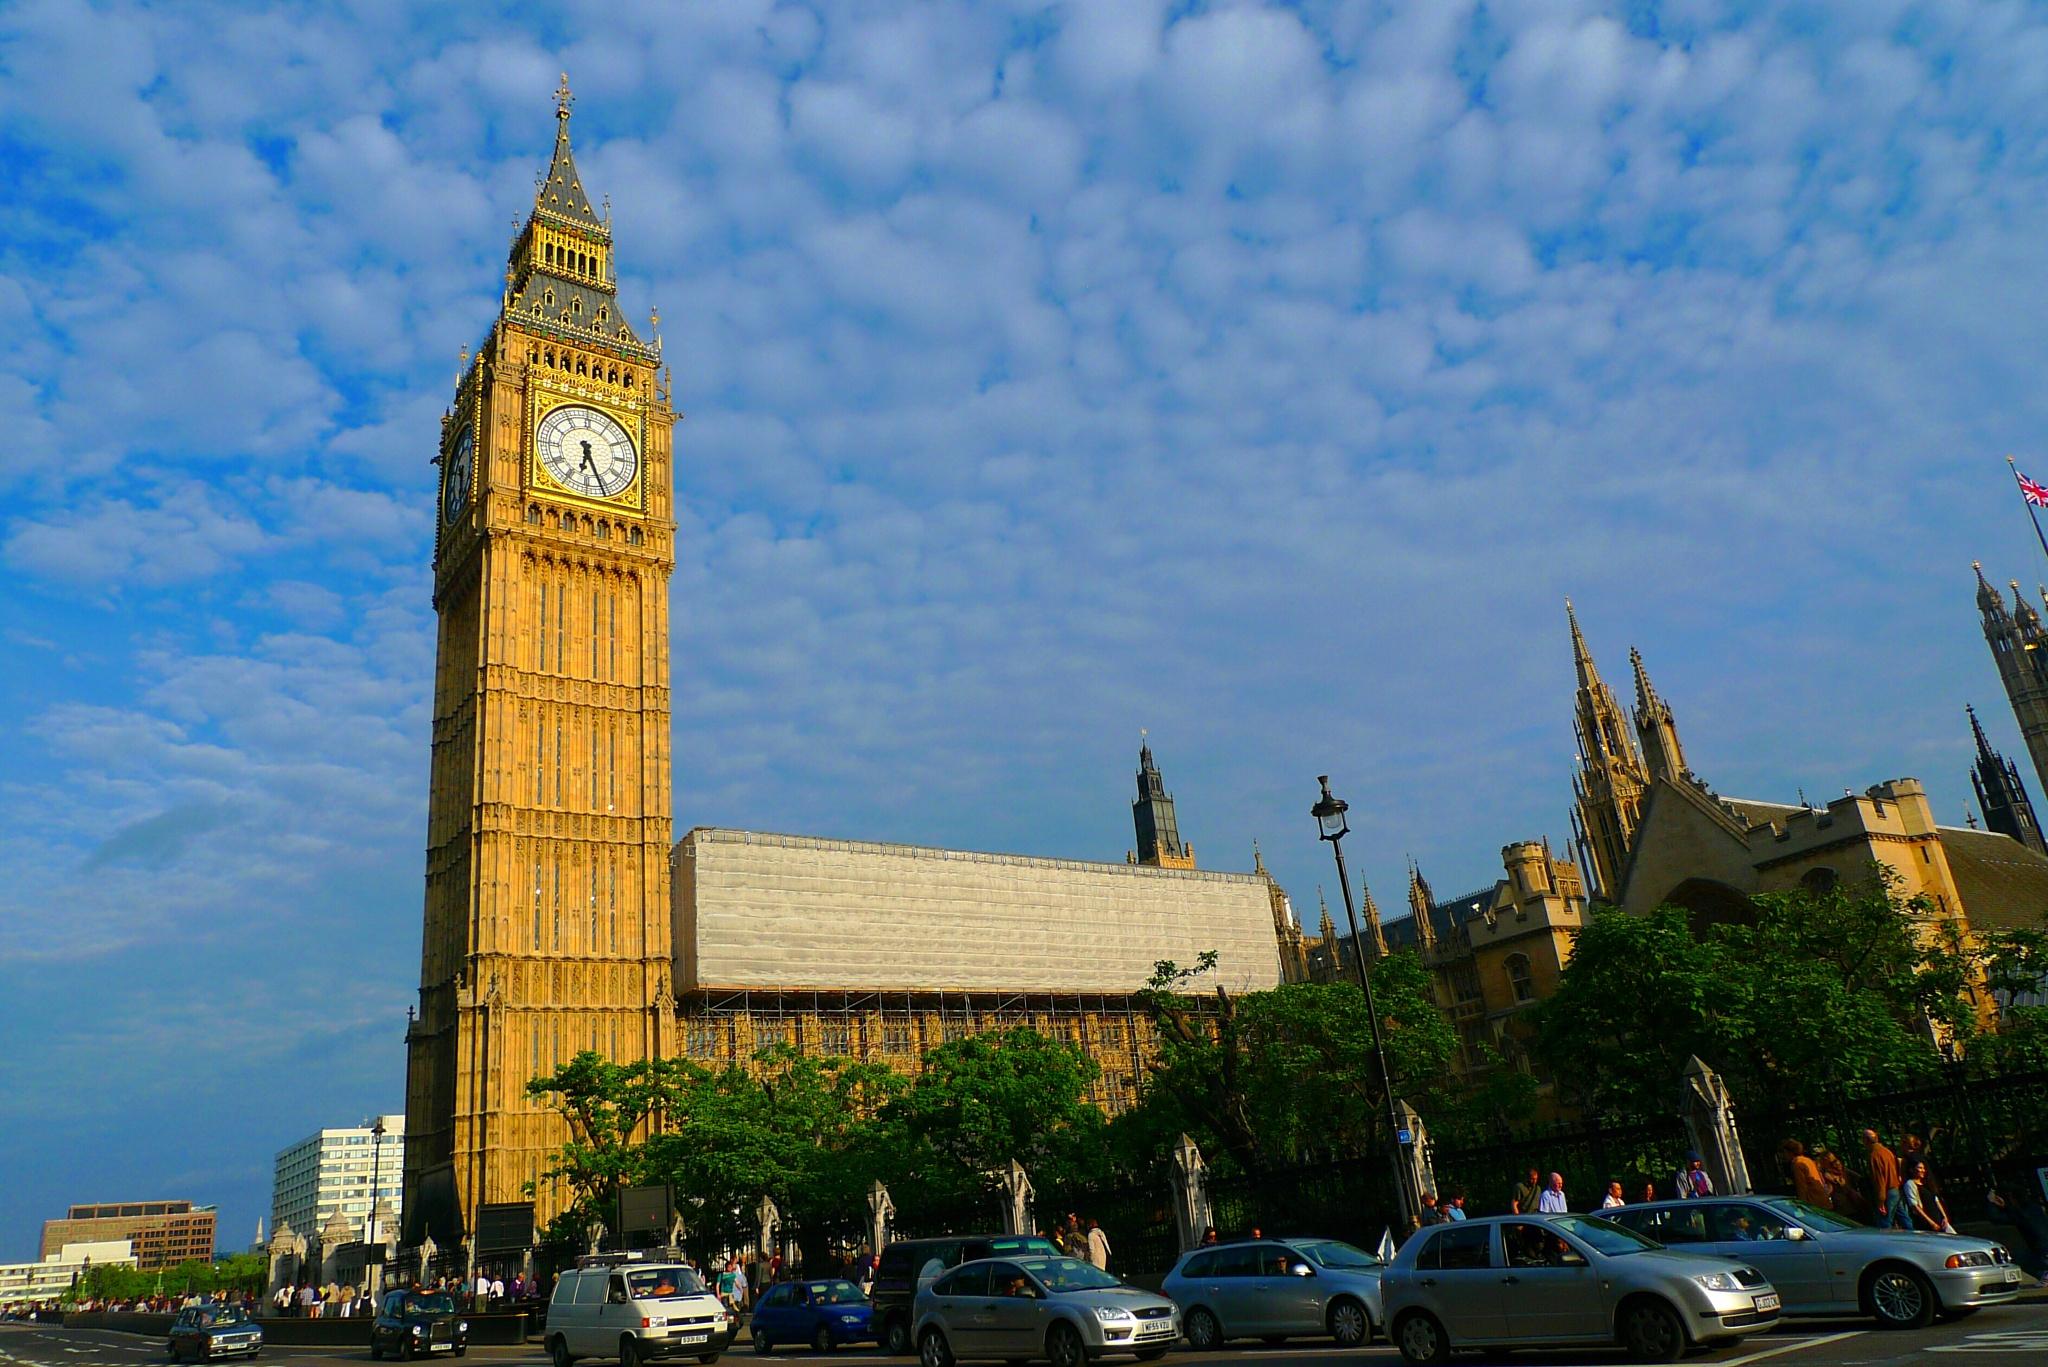 London by sergey.parfeniuk